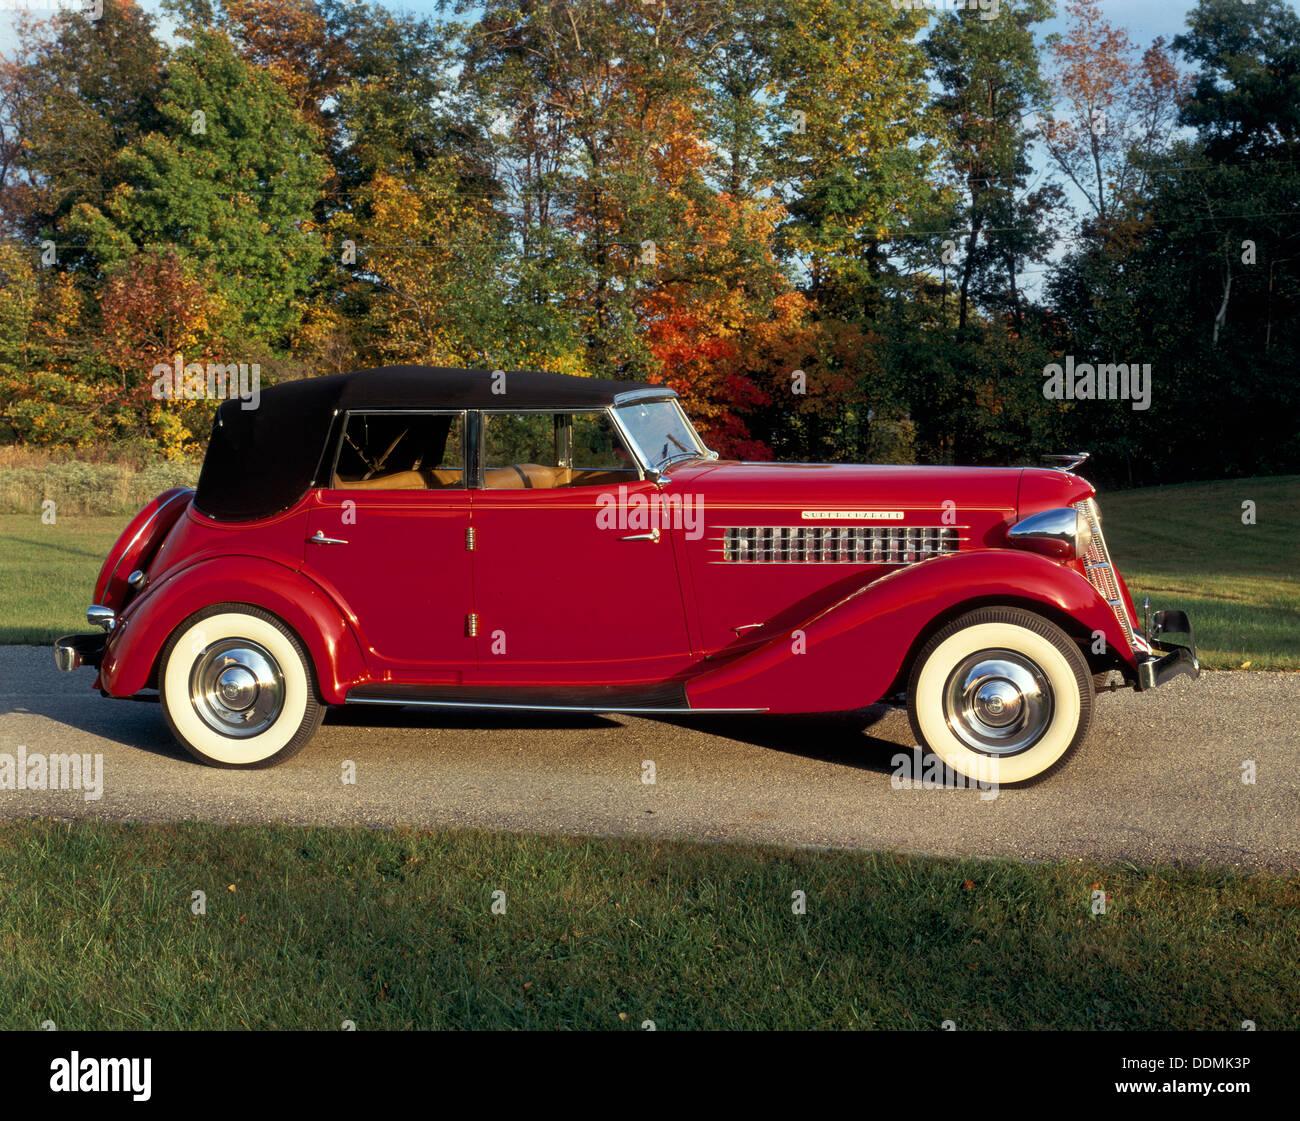 A 1936 Auburn 852 Car On A Gravel Driveway In The Autumn